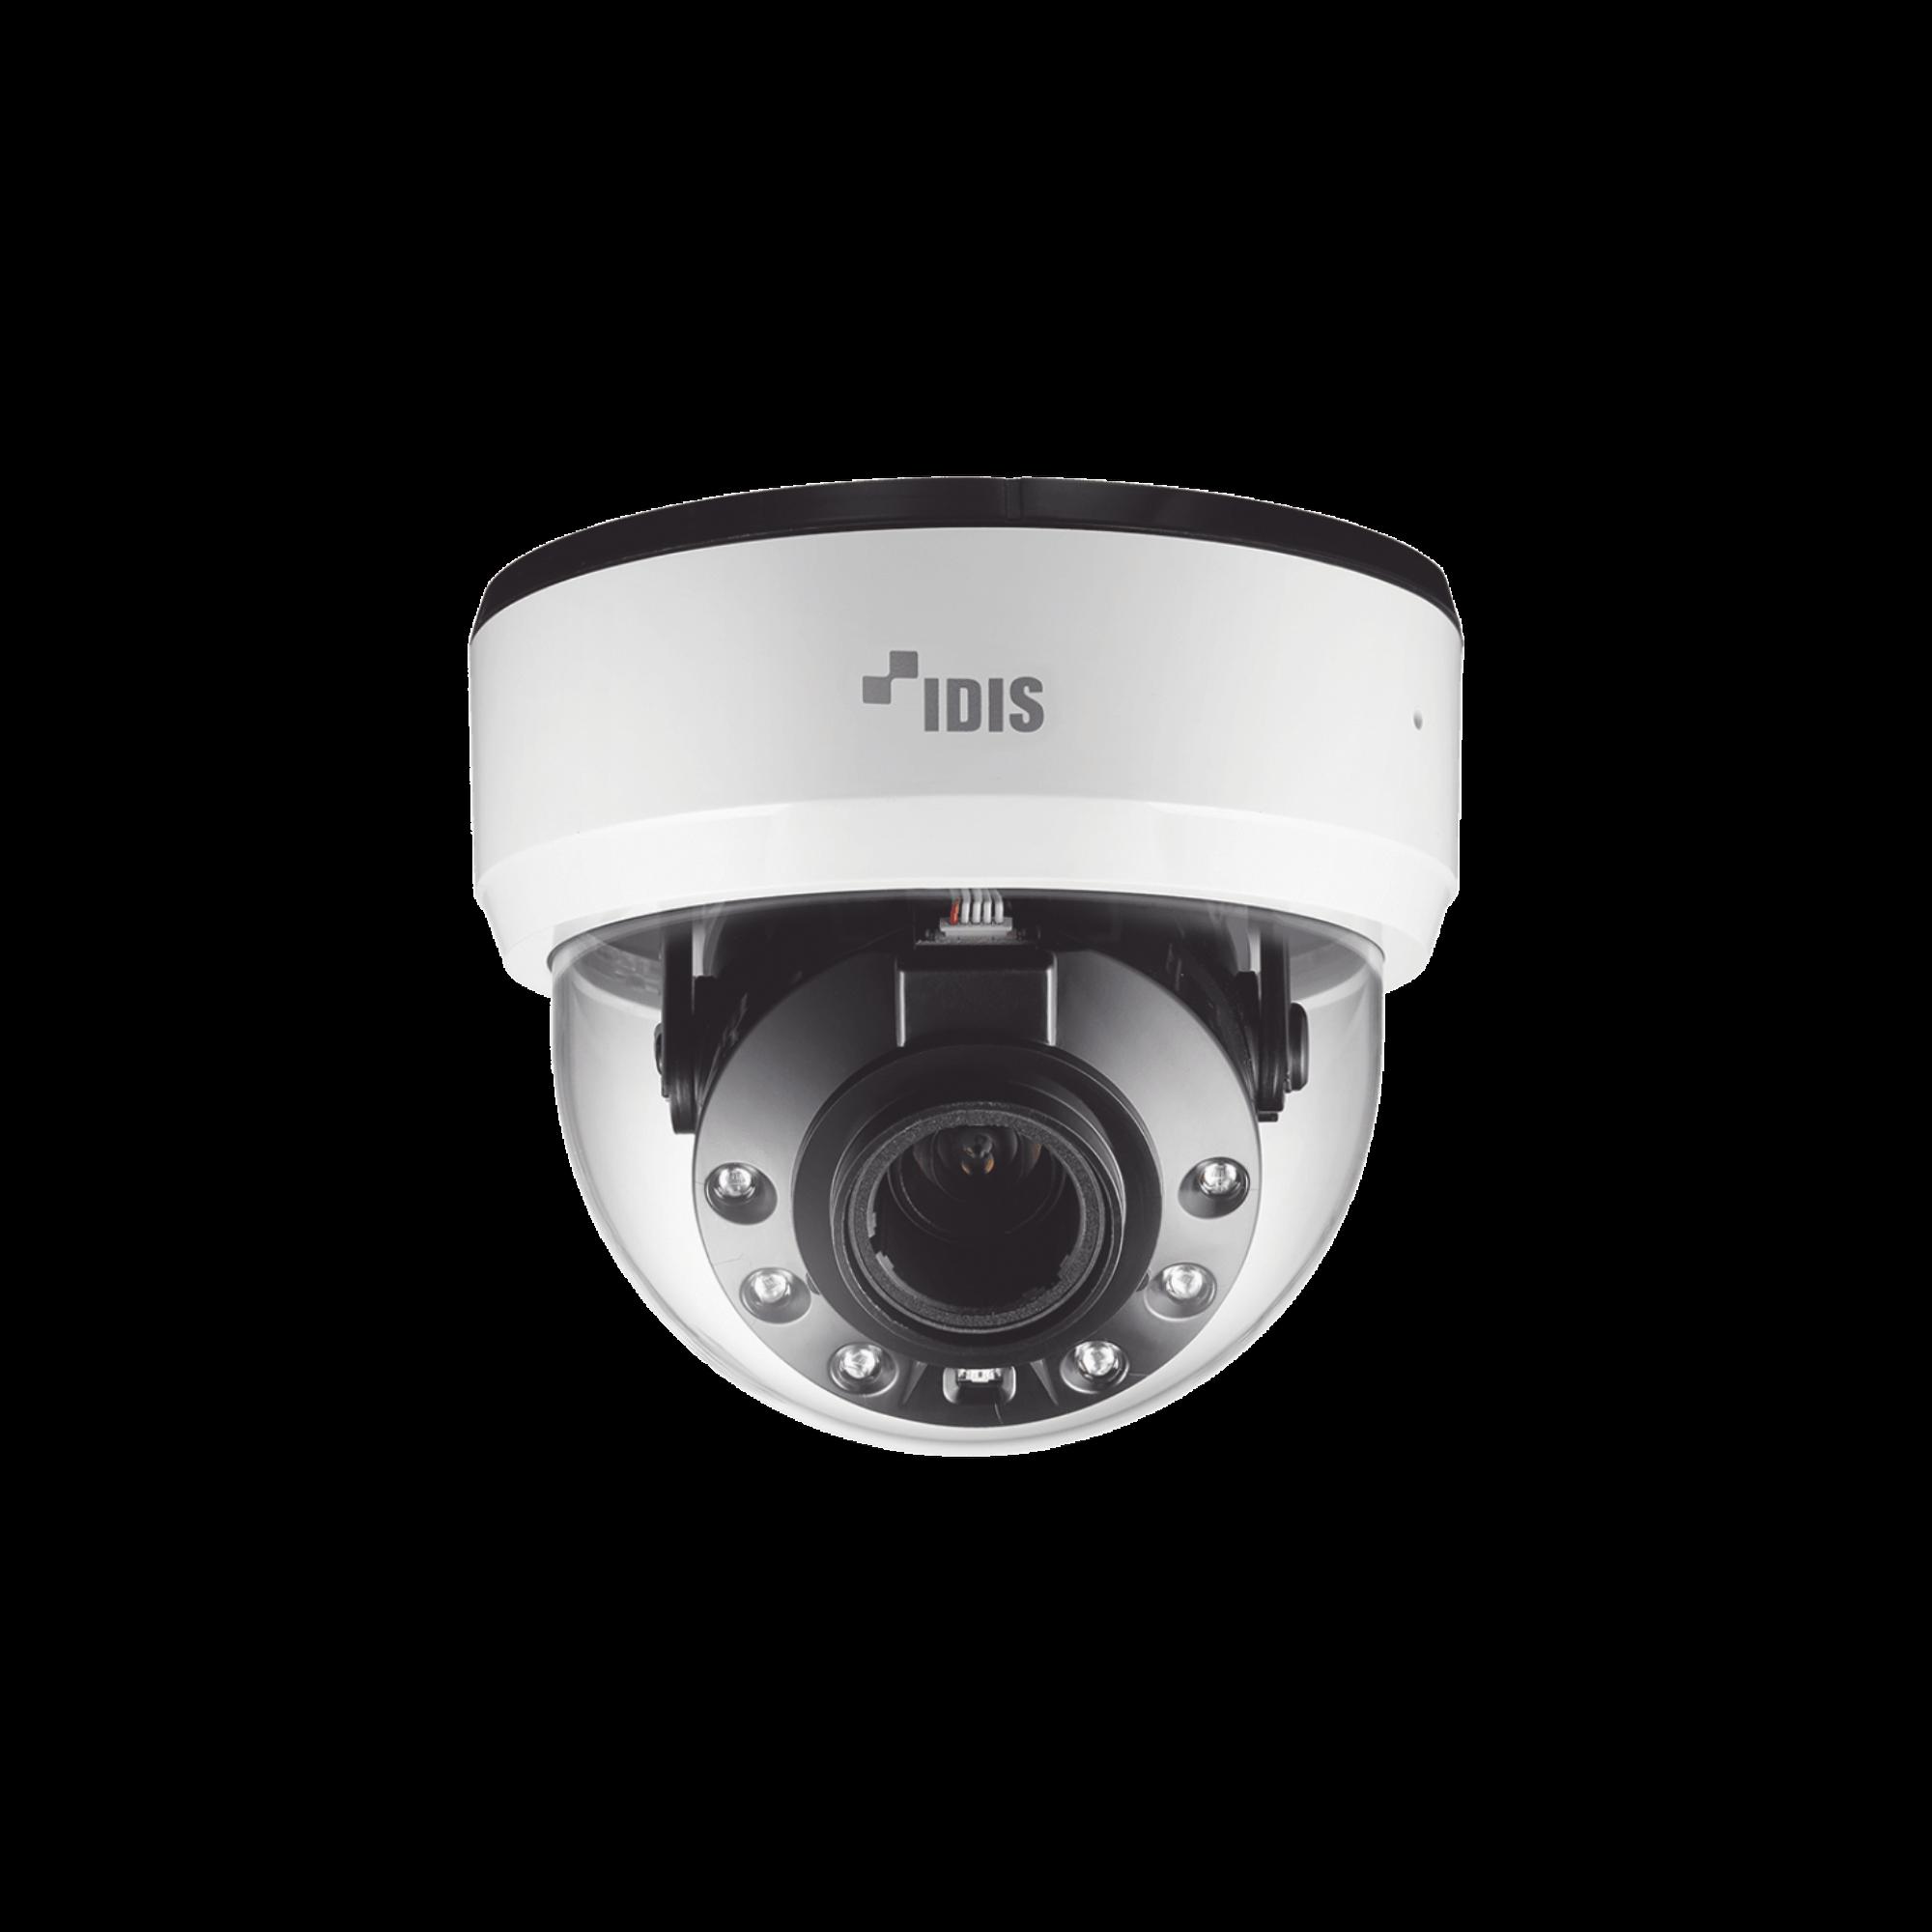 Camara 2 megapixeles (1080p) | Varifocal 2.8mm - 12mm | Audio bidireccional | Alarma I/O | PoE | IR 20m | ONVIF | Dia / Noche ICR | MicroSD | CODEC INTELIGENTE